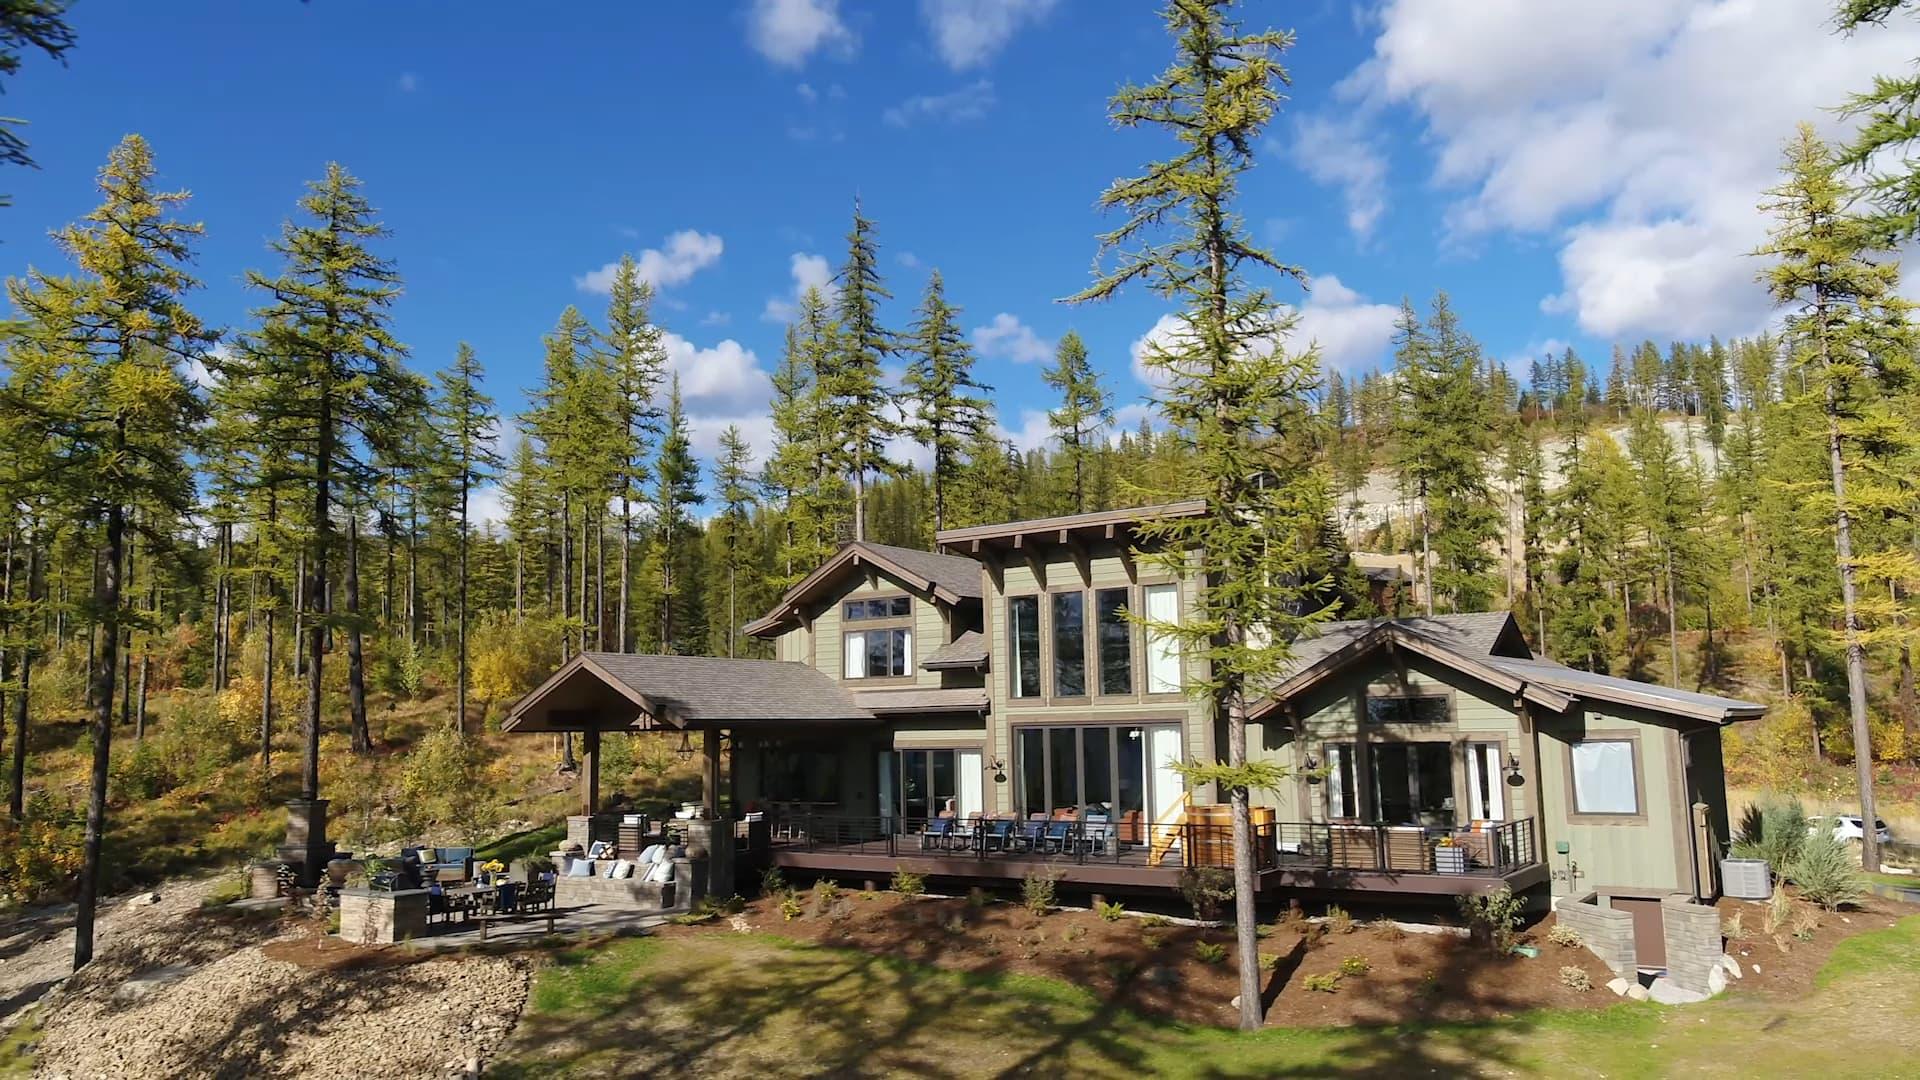 Photos: Inside the multimillion-dollar 2019 HGTV Dream Home